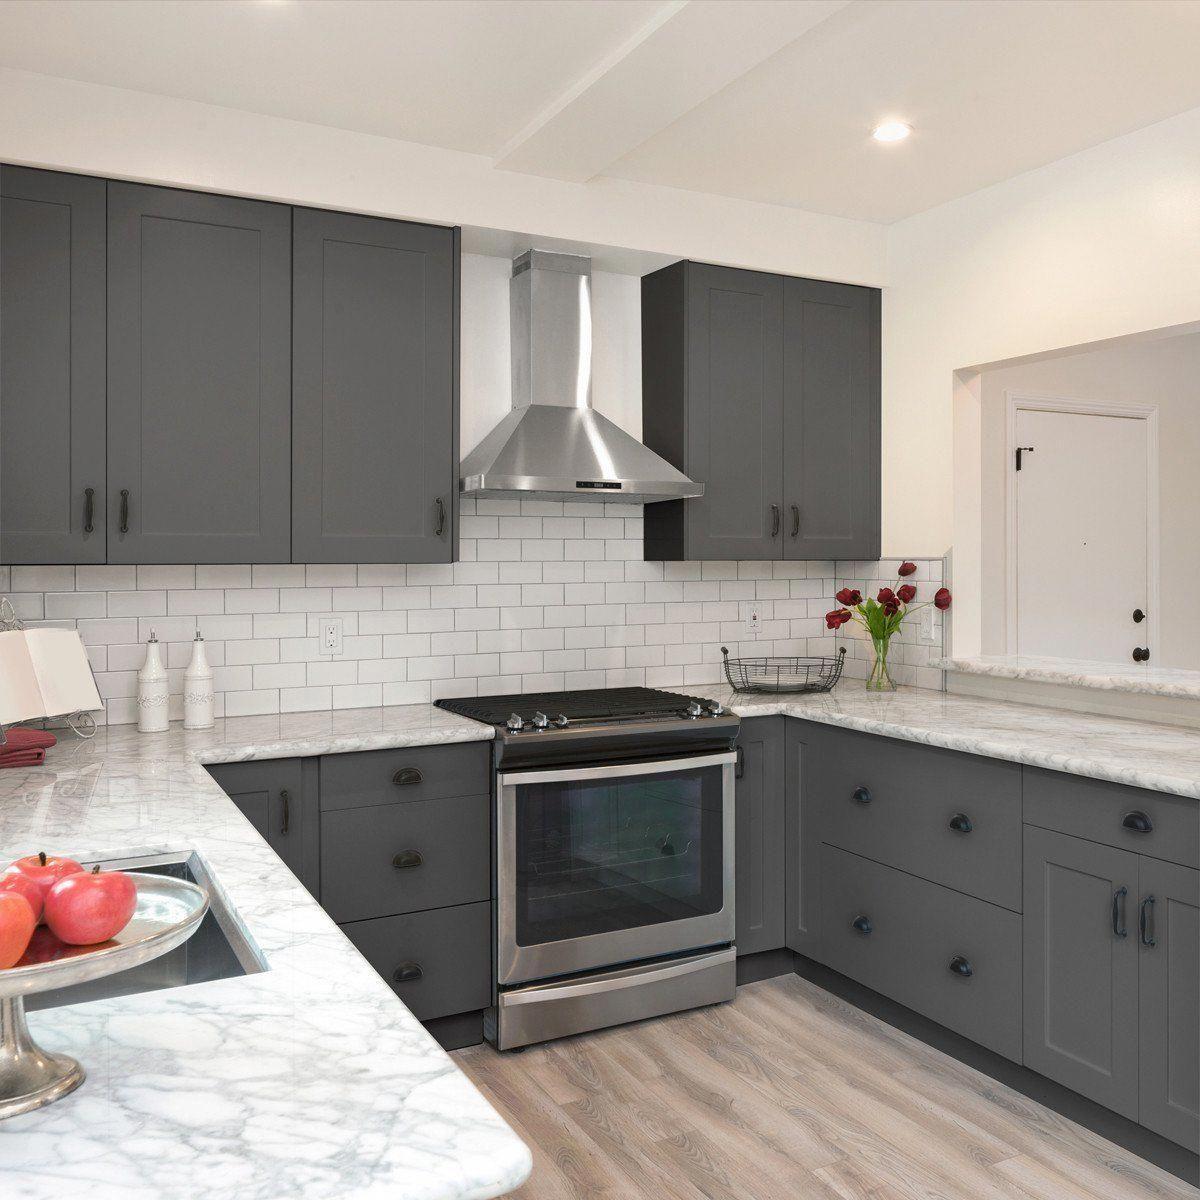 Kitchen Designs Nuvo Earl Grey Cabinet Paint Kit Paintingkitchencabinets Kitchen Renovation Modern Kitchen Grey Kitchen Cabinets